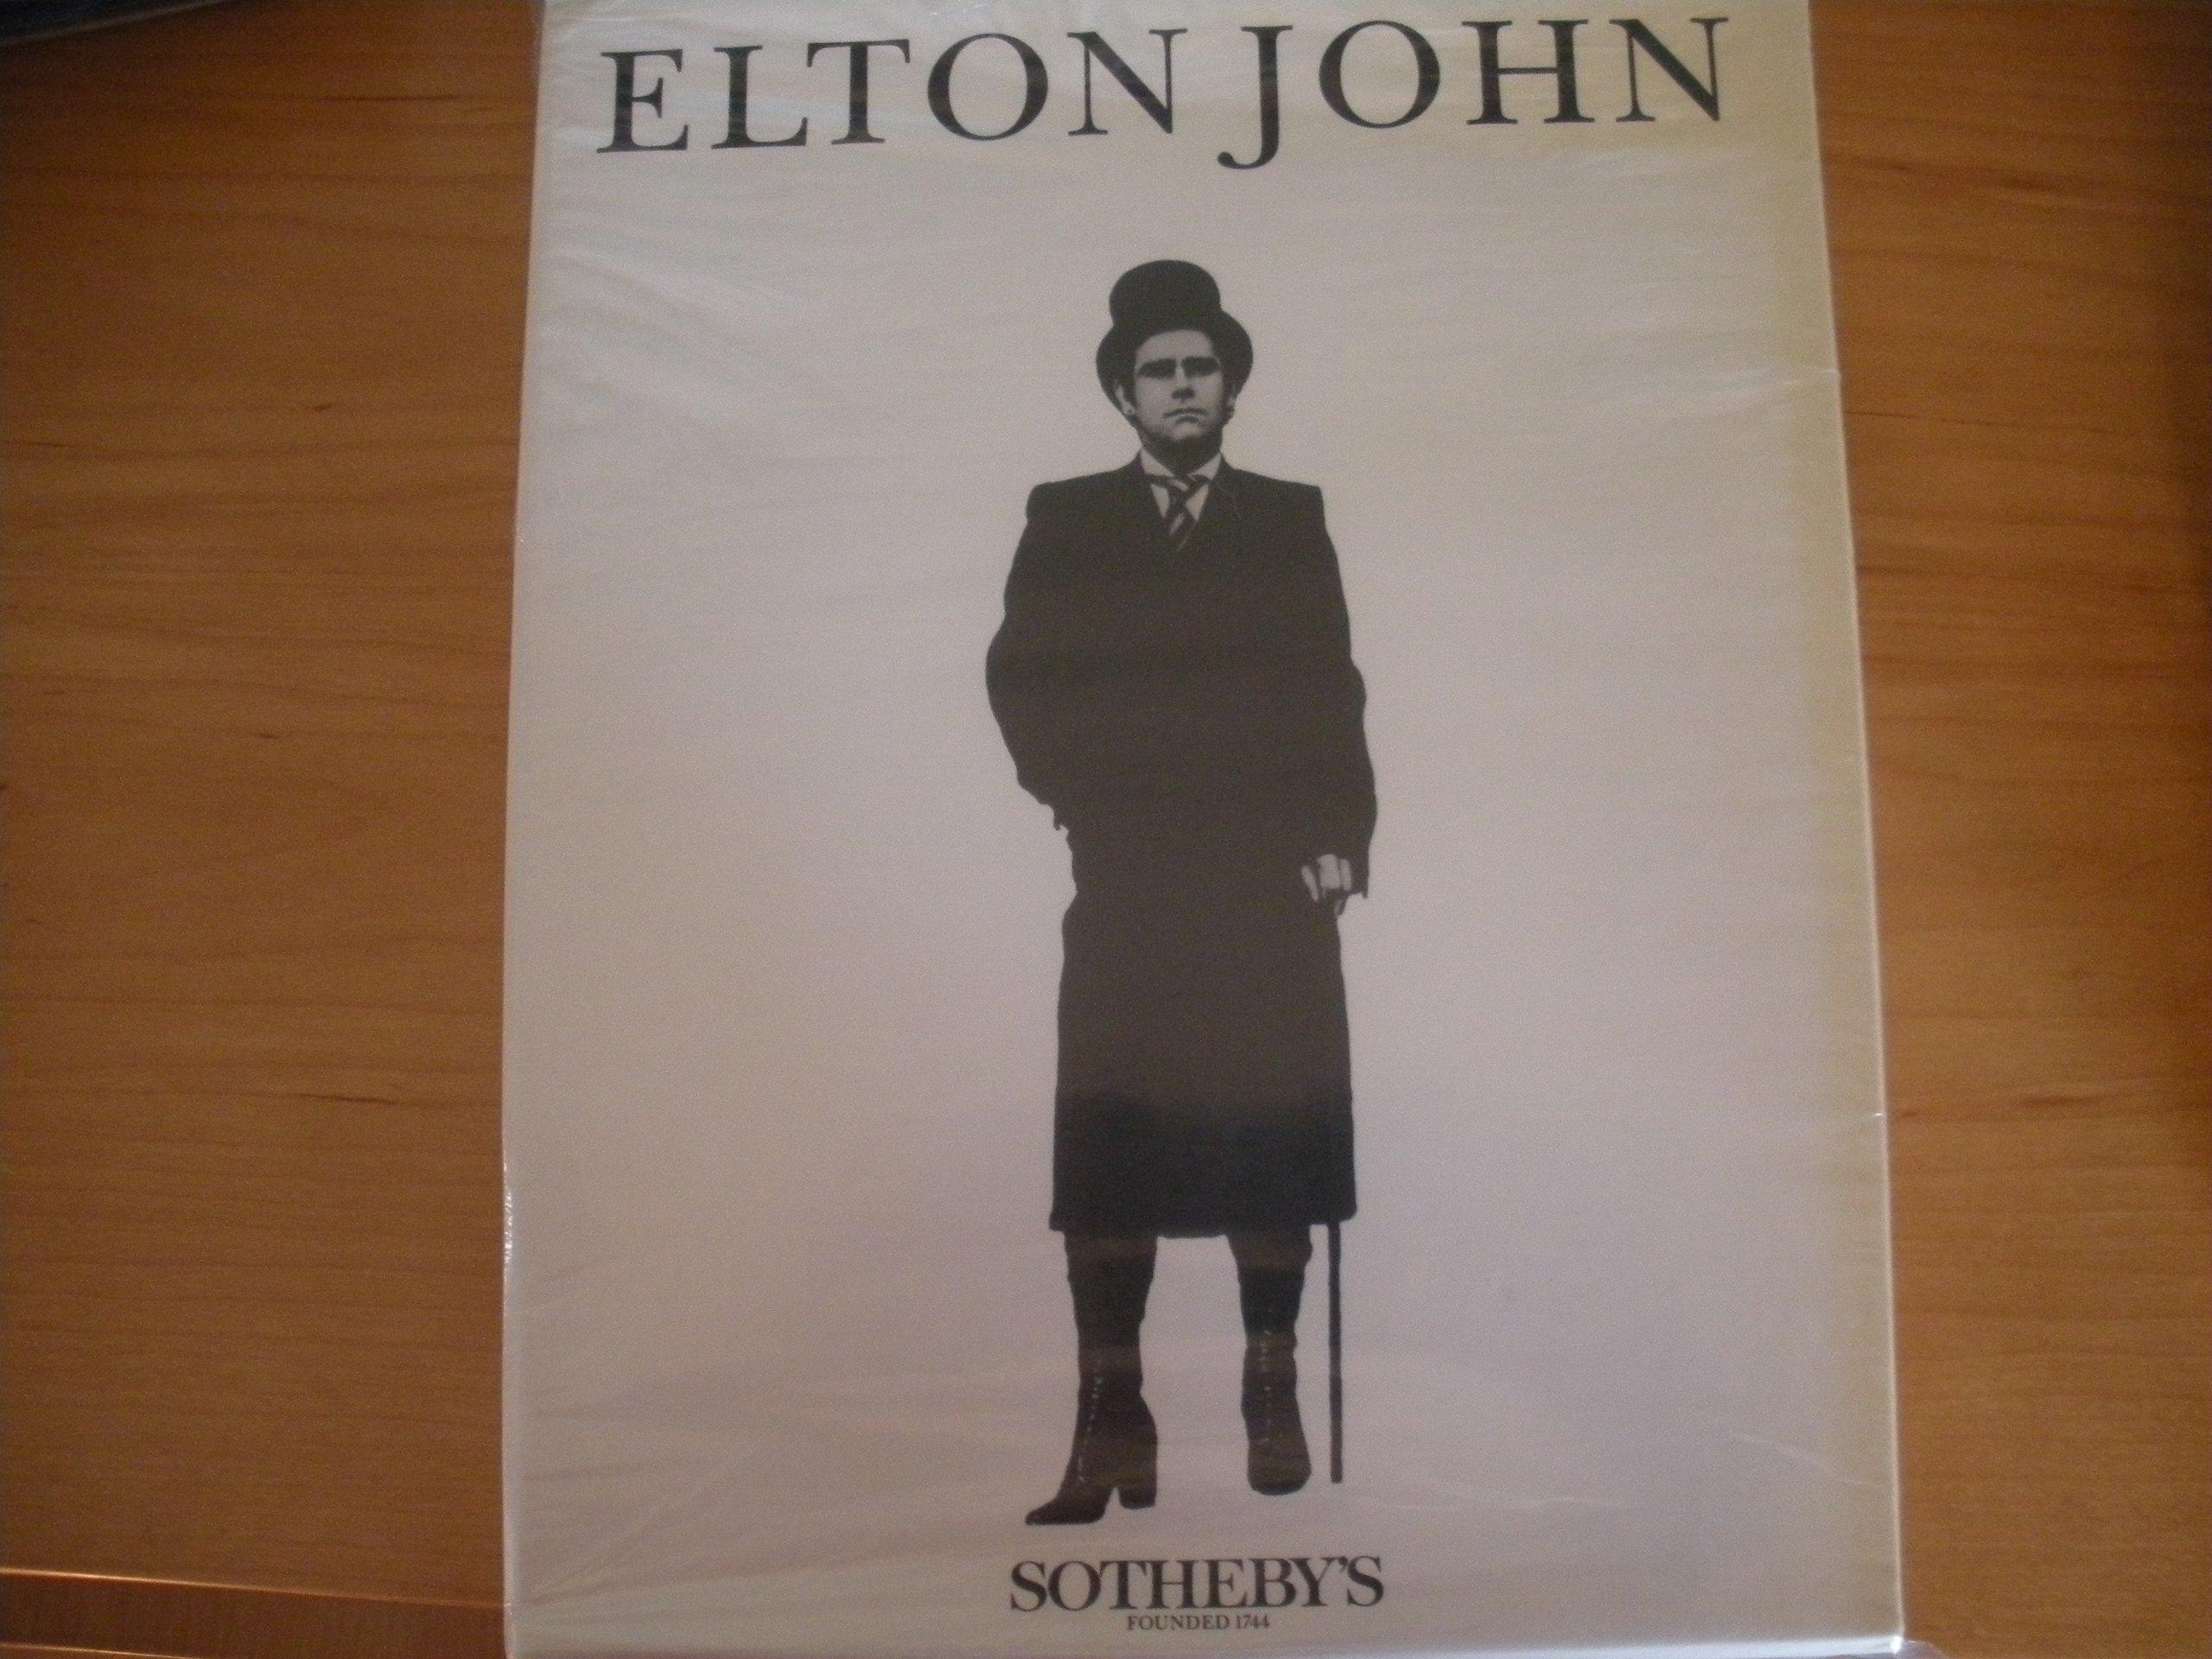 Elton John Collection Auction Catalogue 4 Volumes: Sotheby's: Amazon:  Books